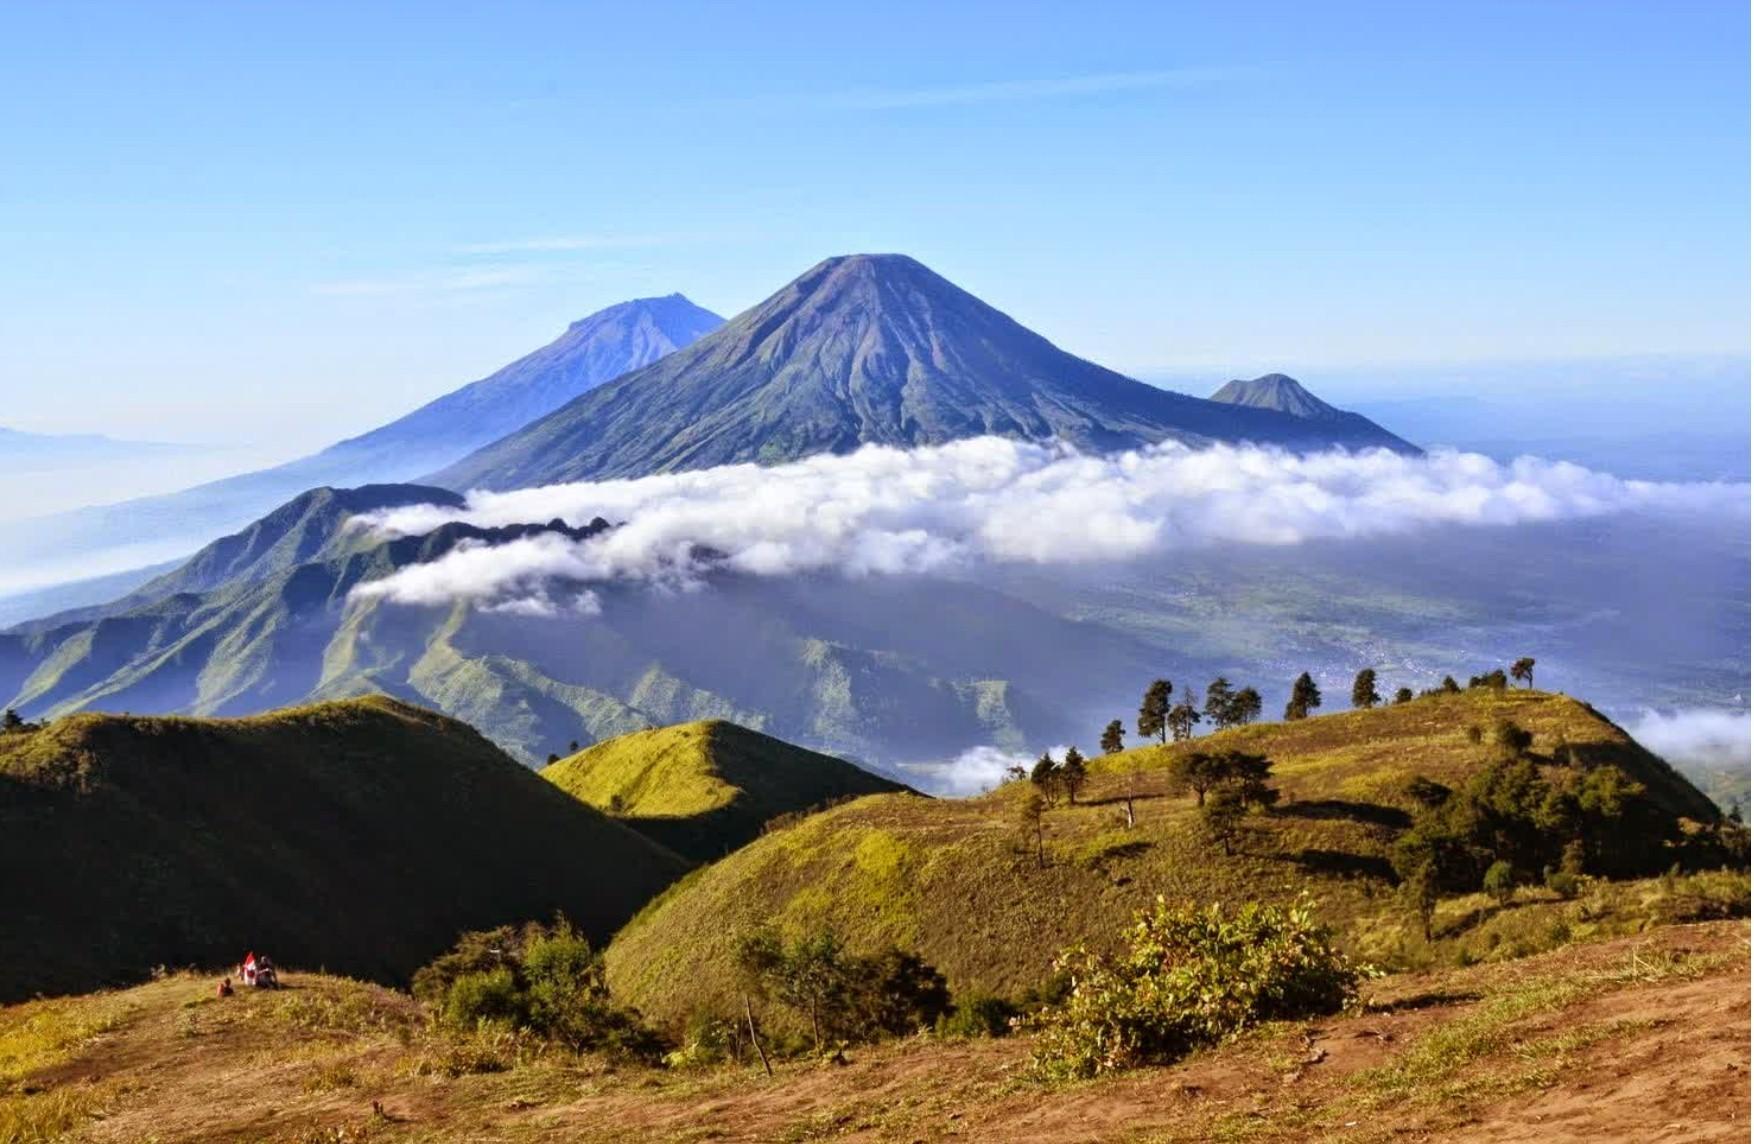 mount prau in volcano area